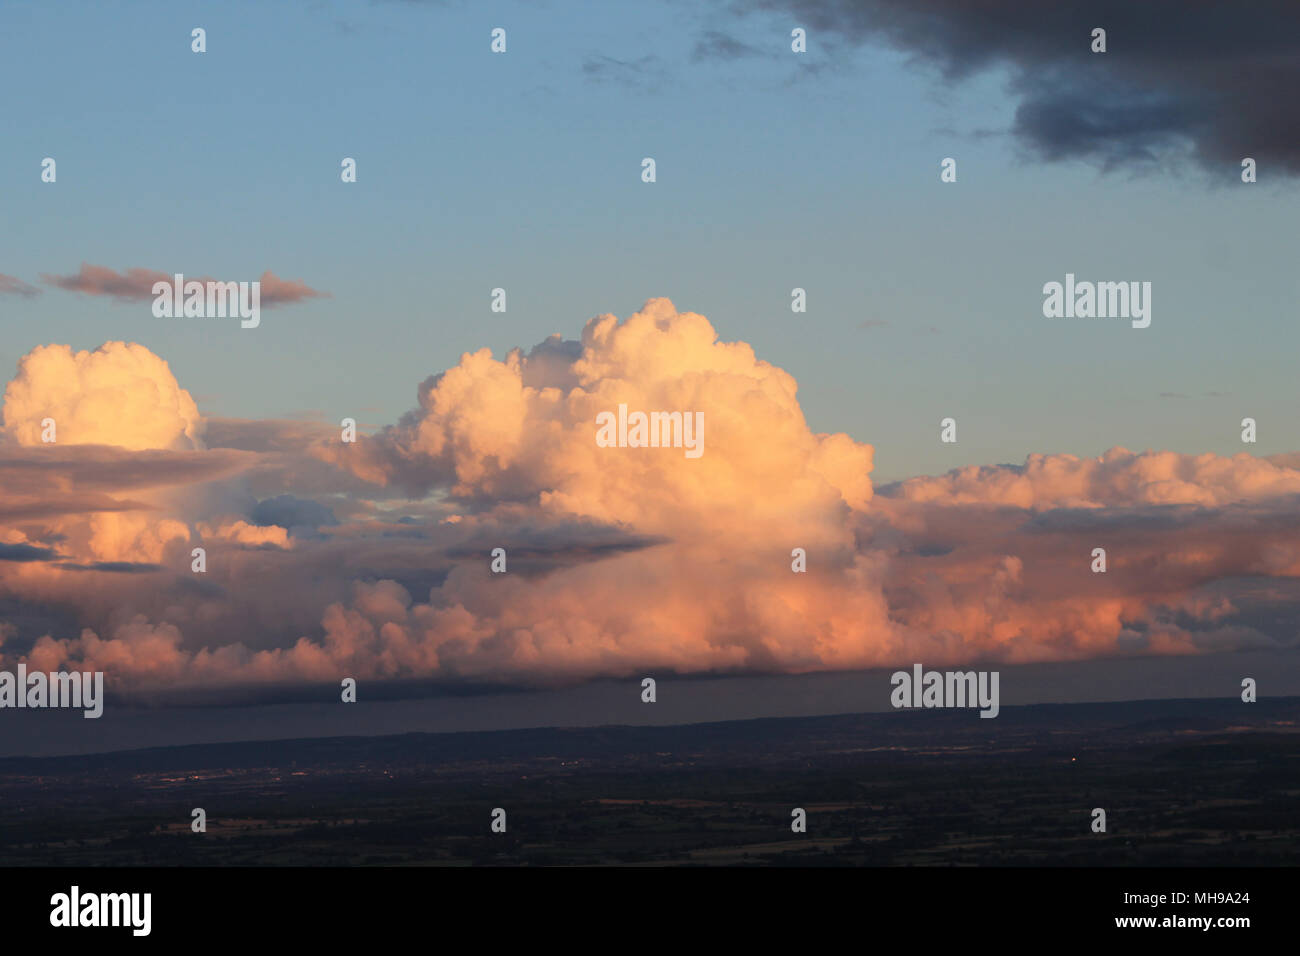 Cumulonimbus at Sunset - Stock Image